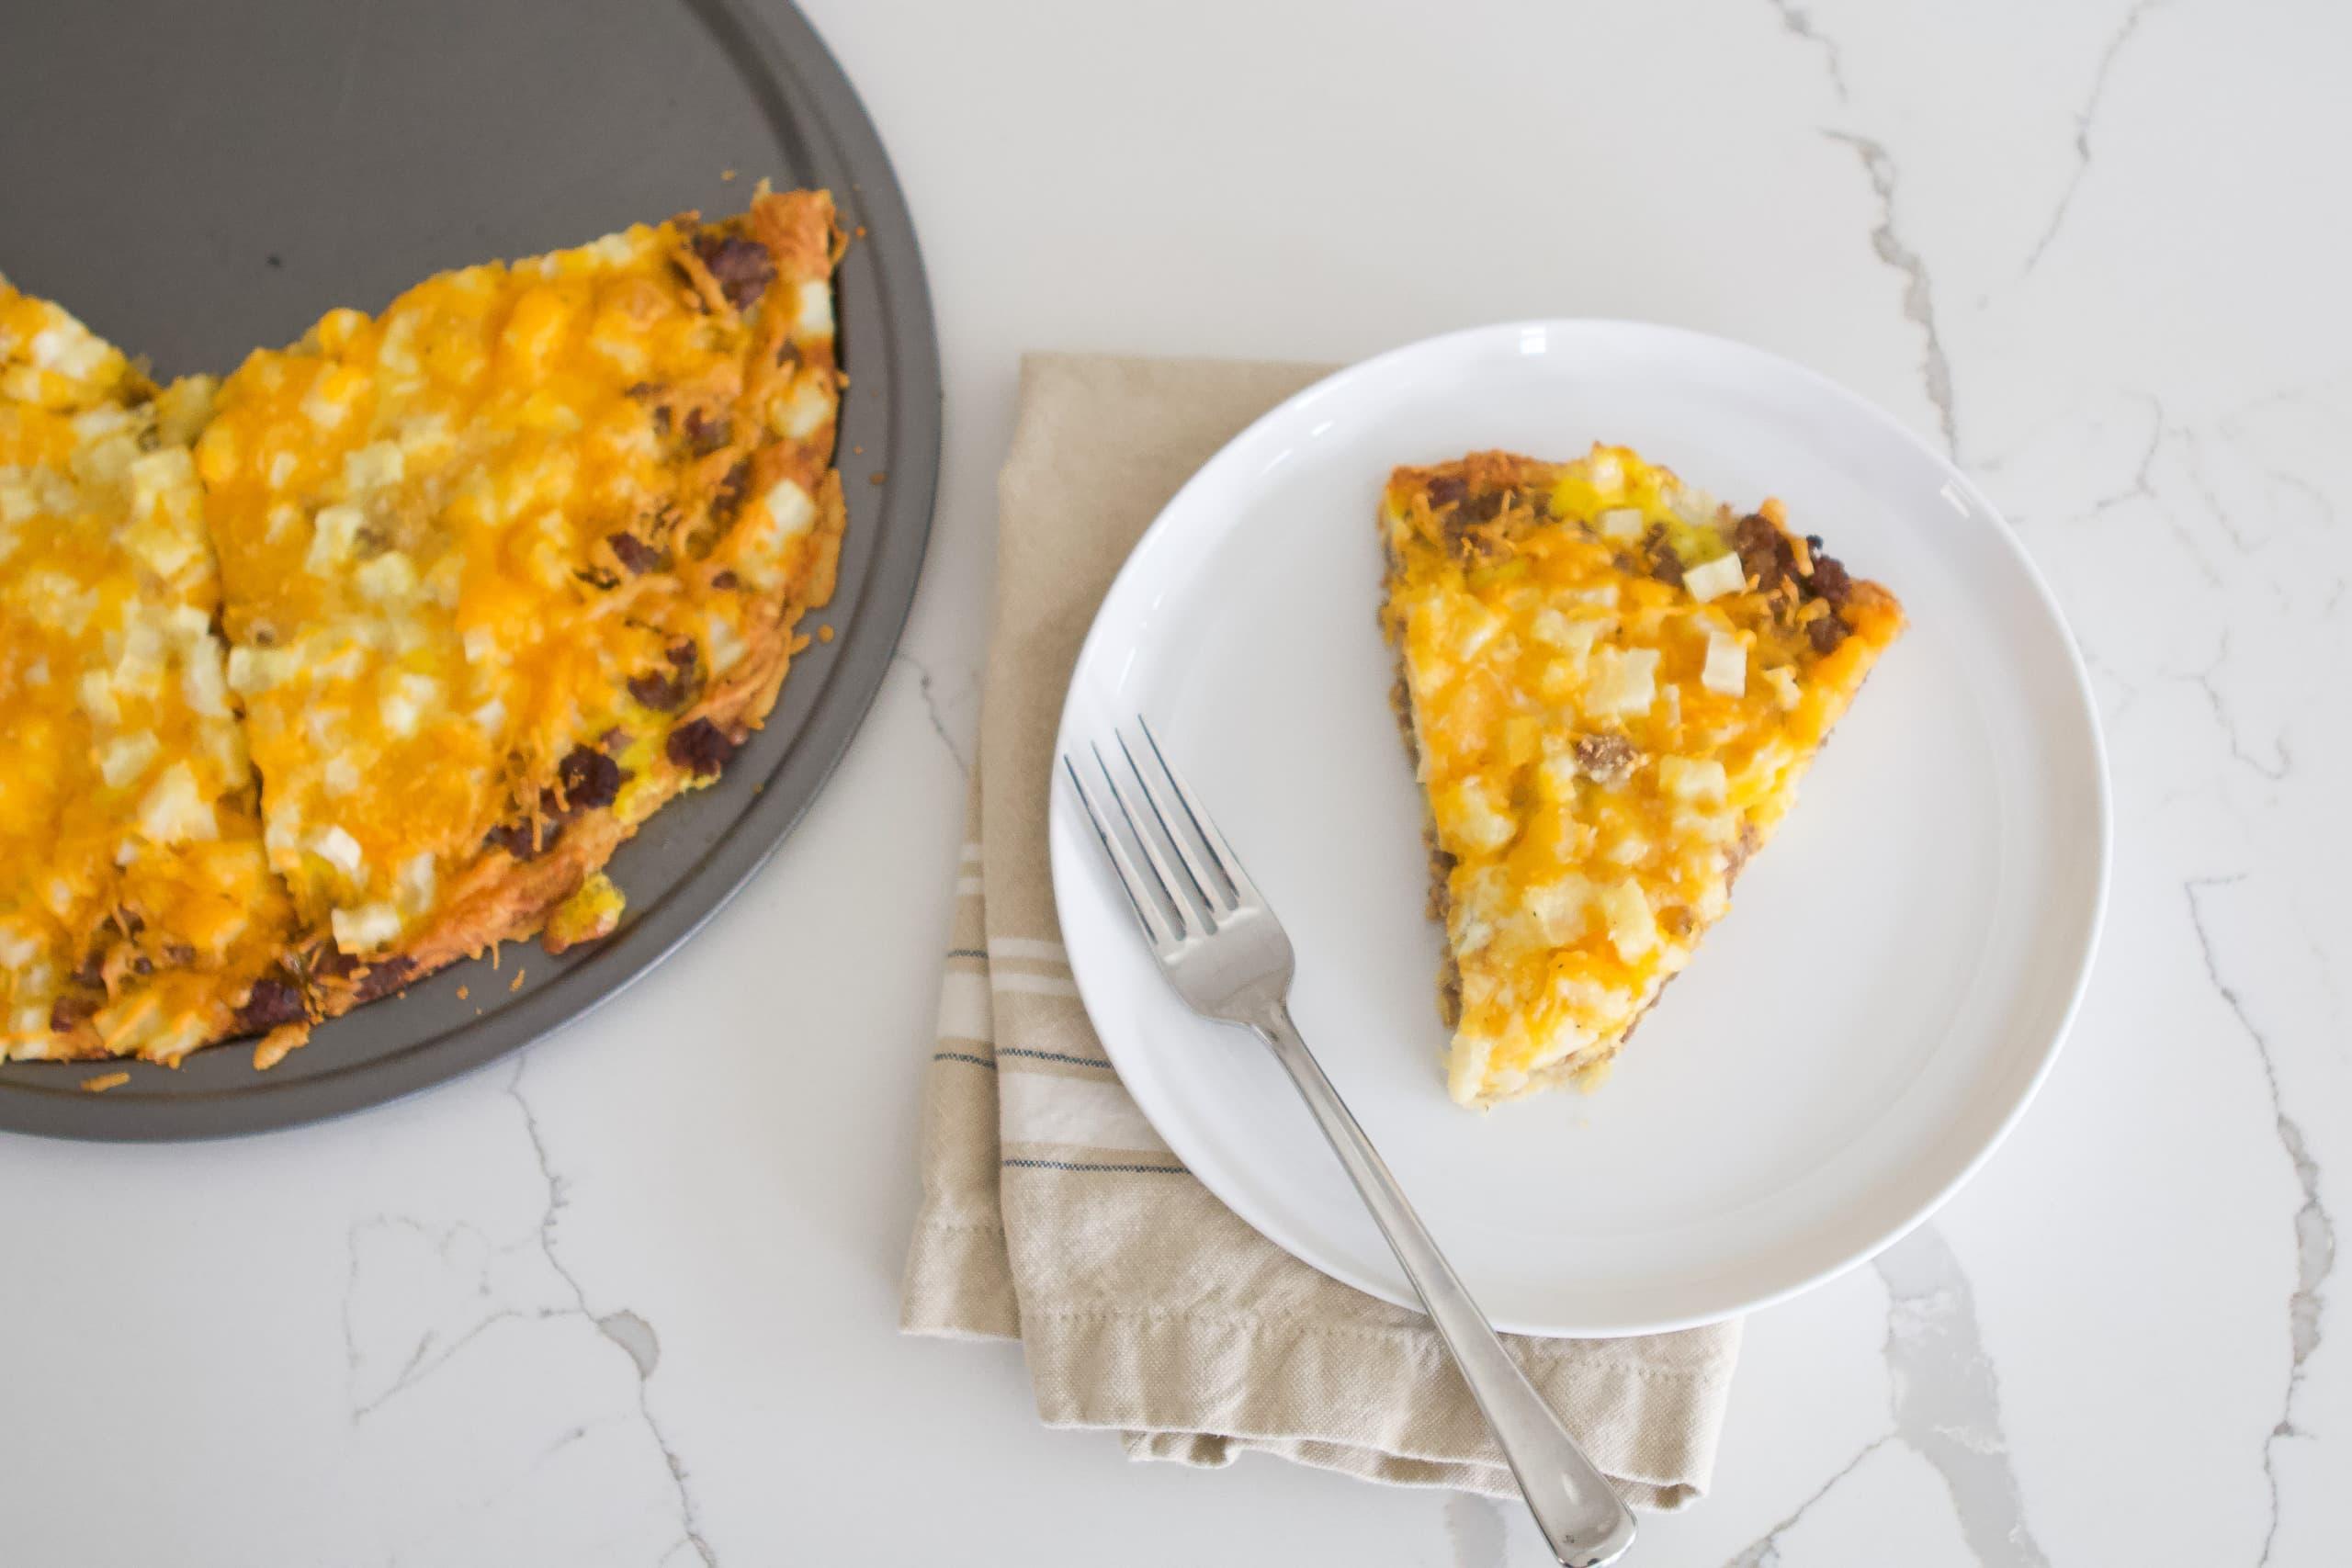 Our family favorite cheesy breakfast pizza recipe